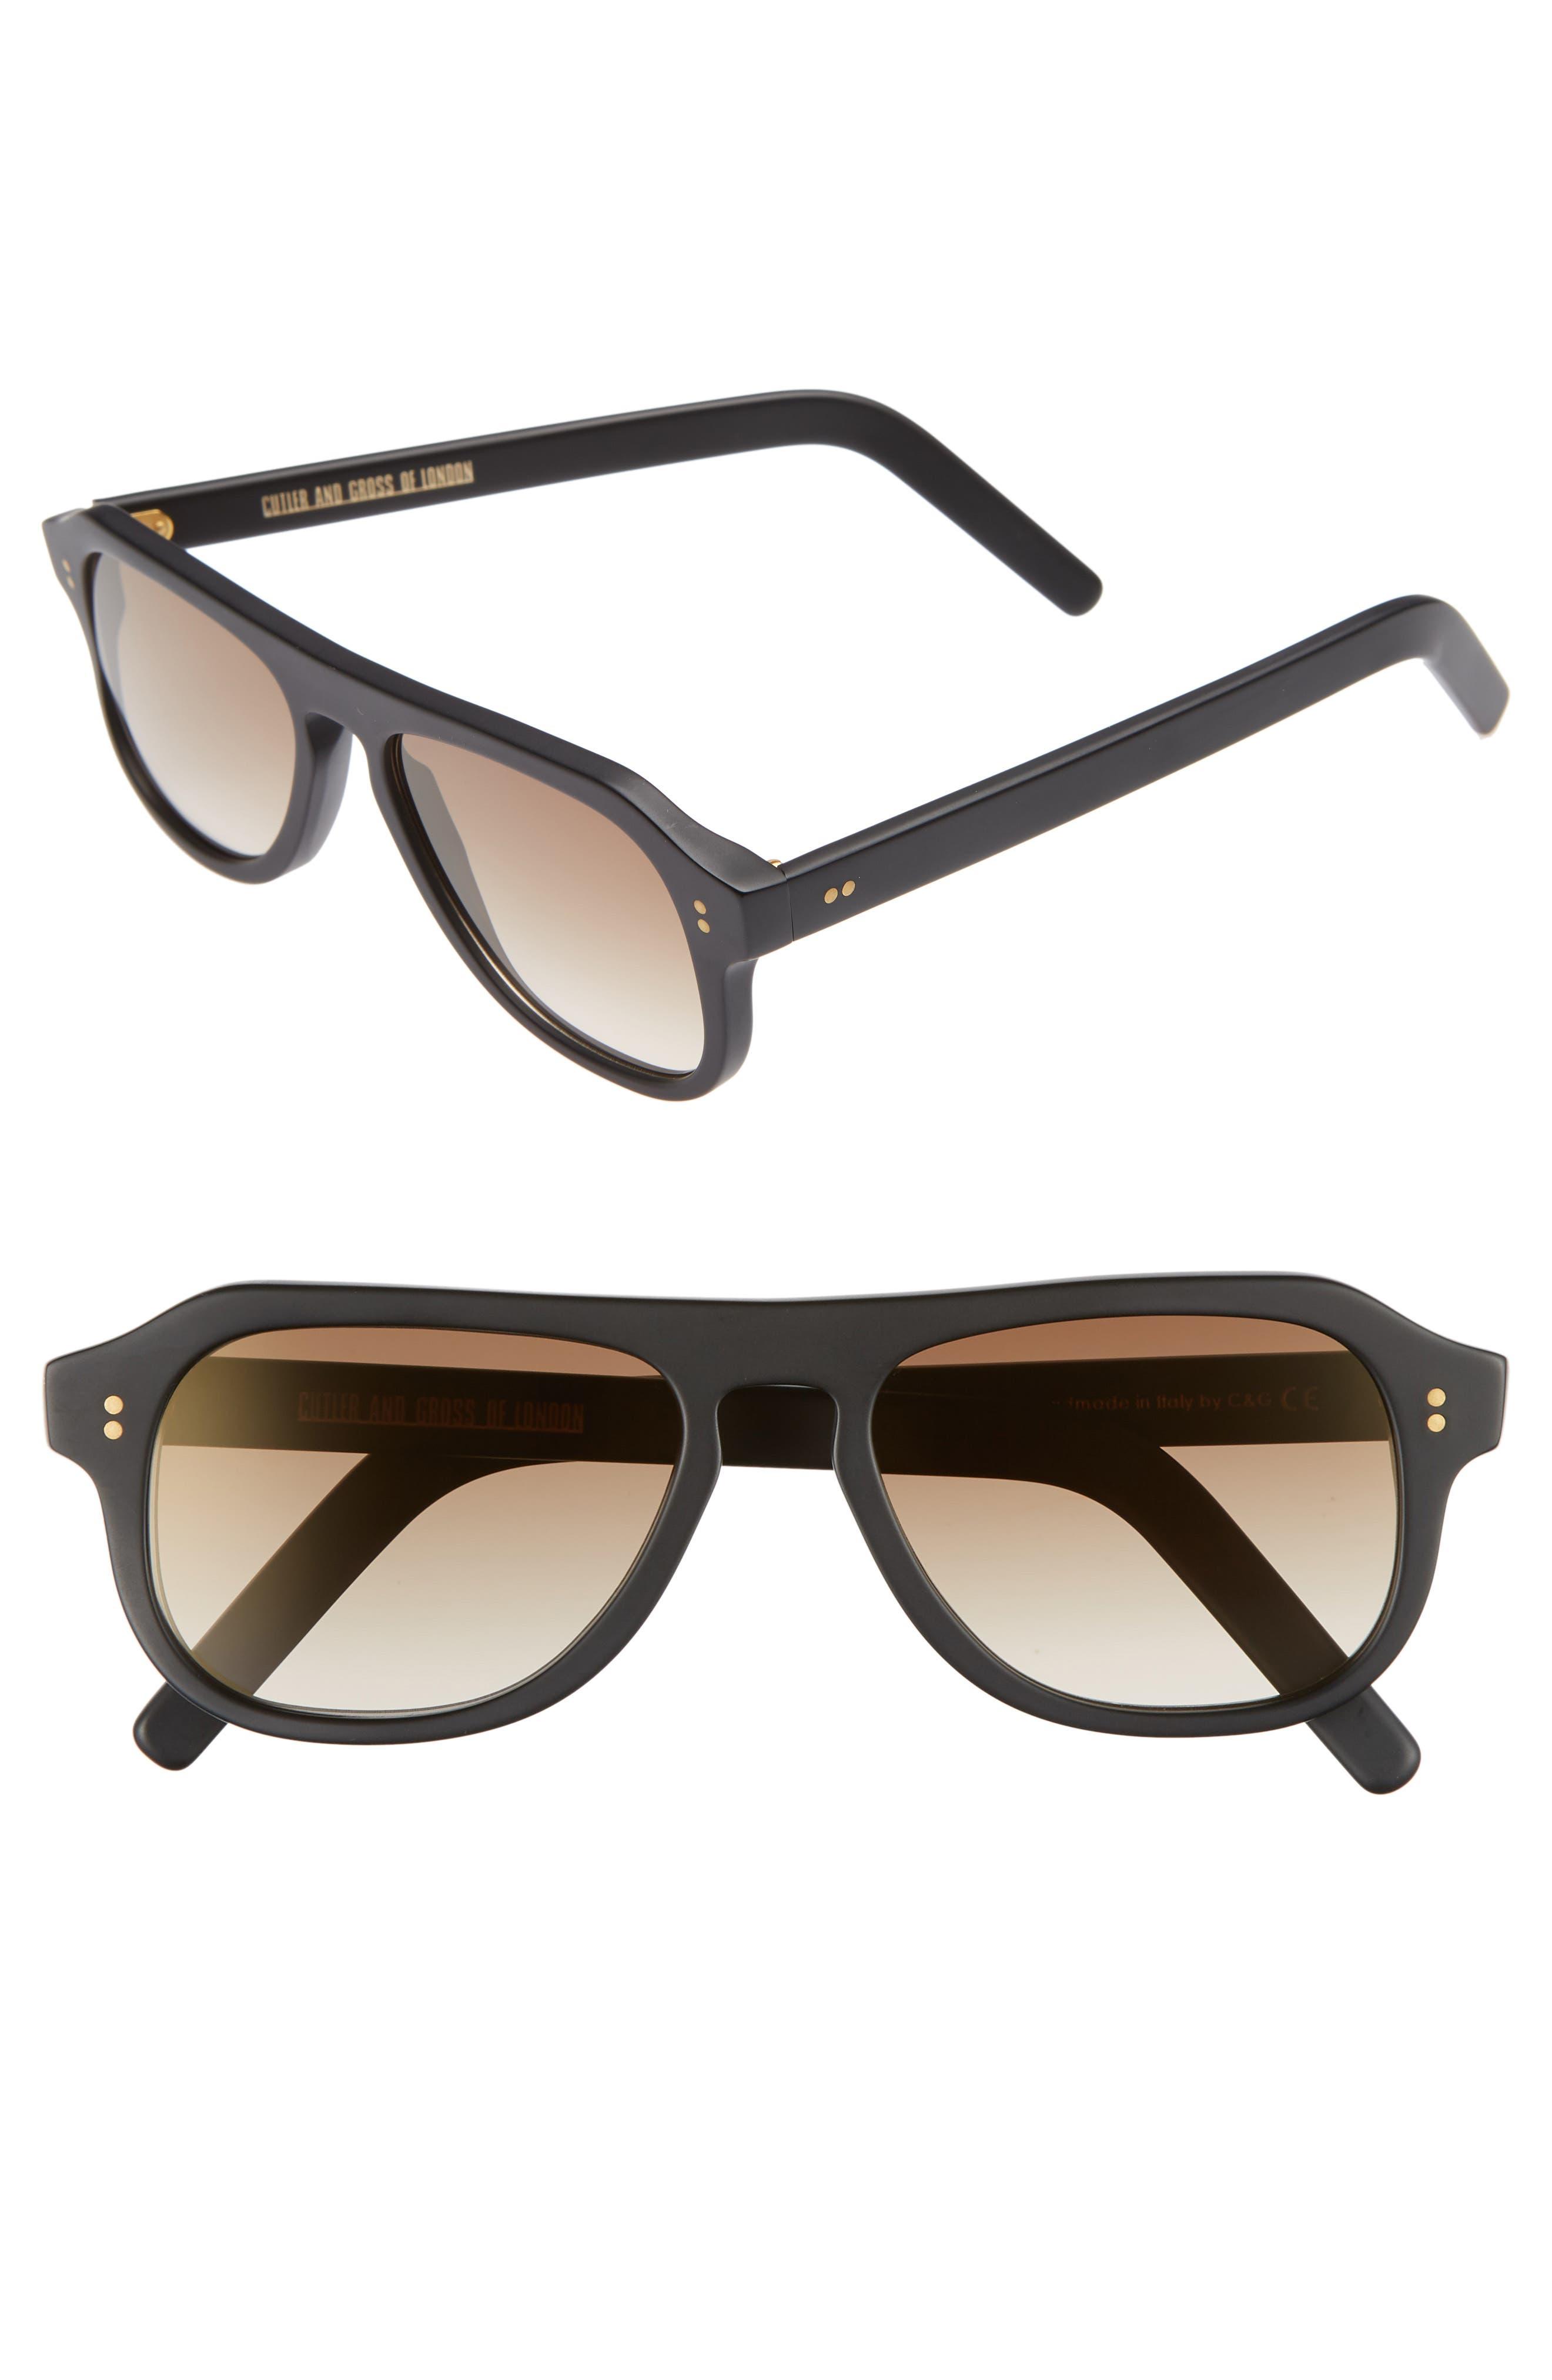 53mm Polarized Sunglasses,                         Main,                         color, MATTE BLACK/ BROWN